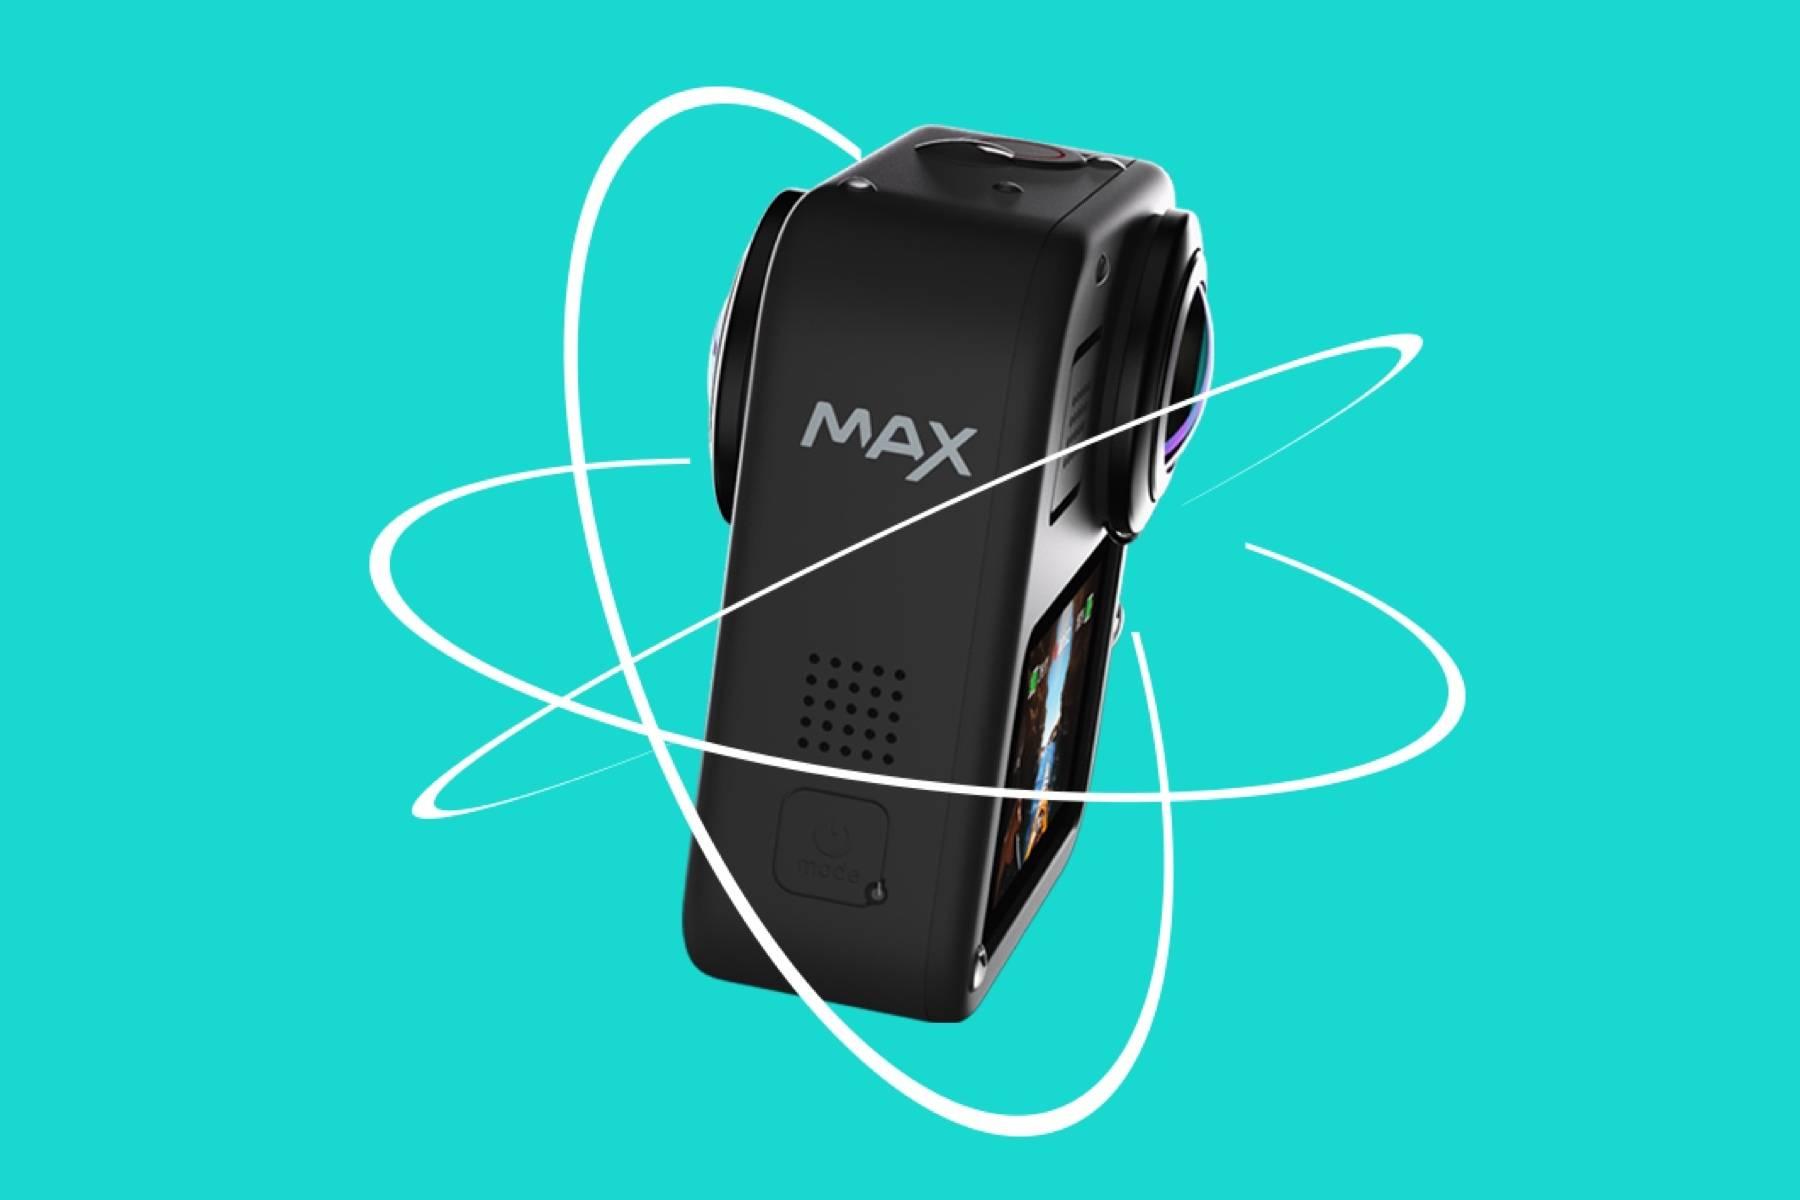 Vlog神器GoPro Max:可能是最易用的全景运动相机